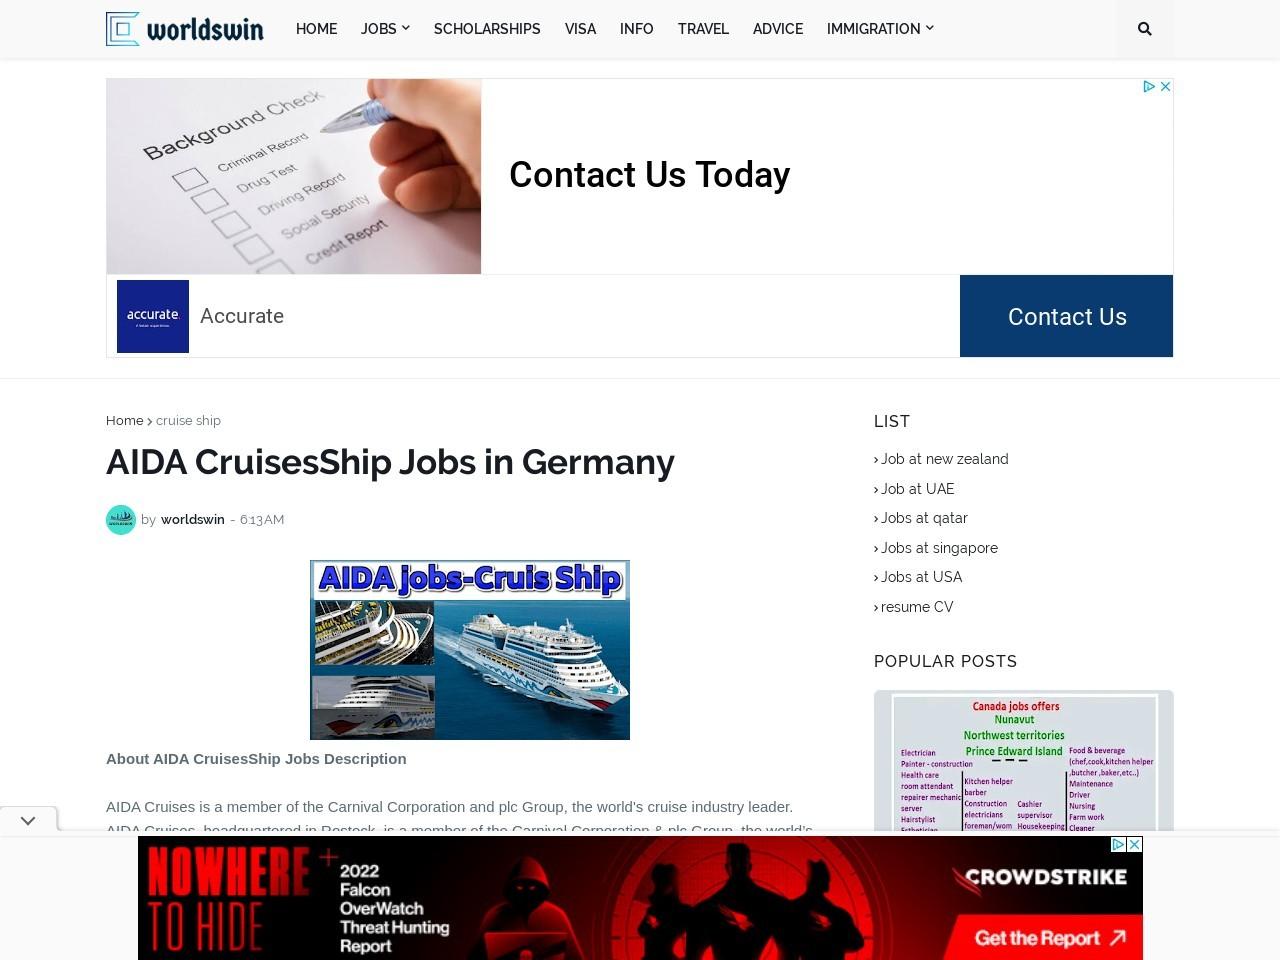 AIDA CruisesShip Jobs in Germany